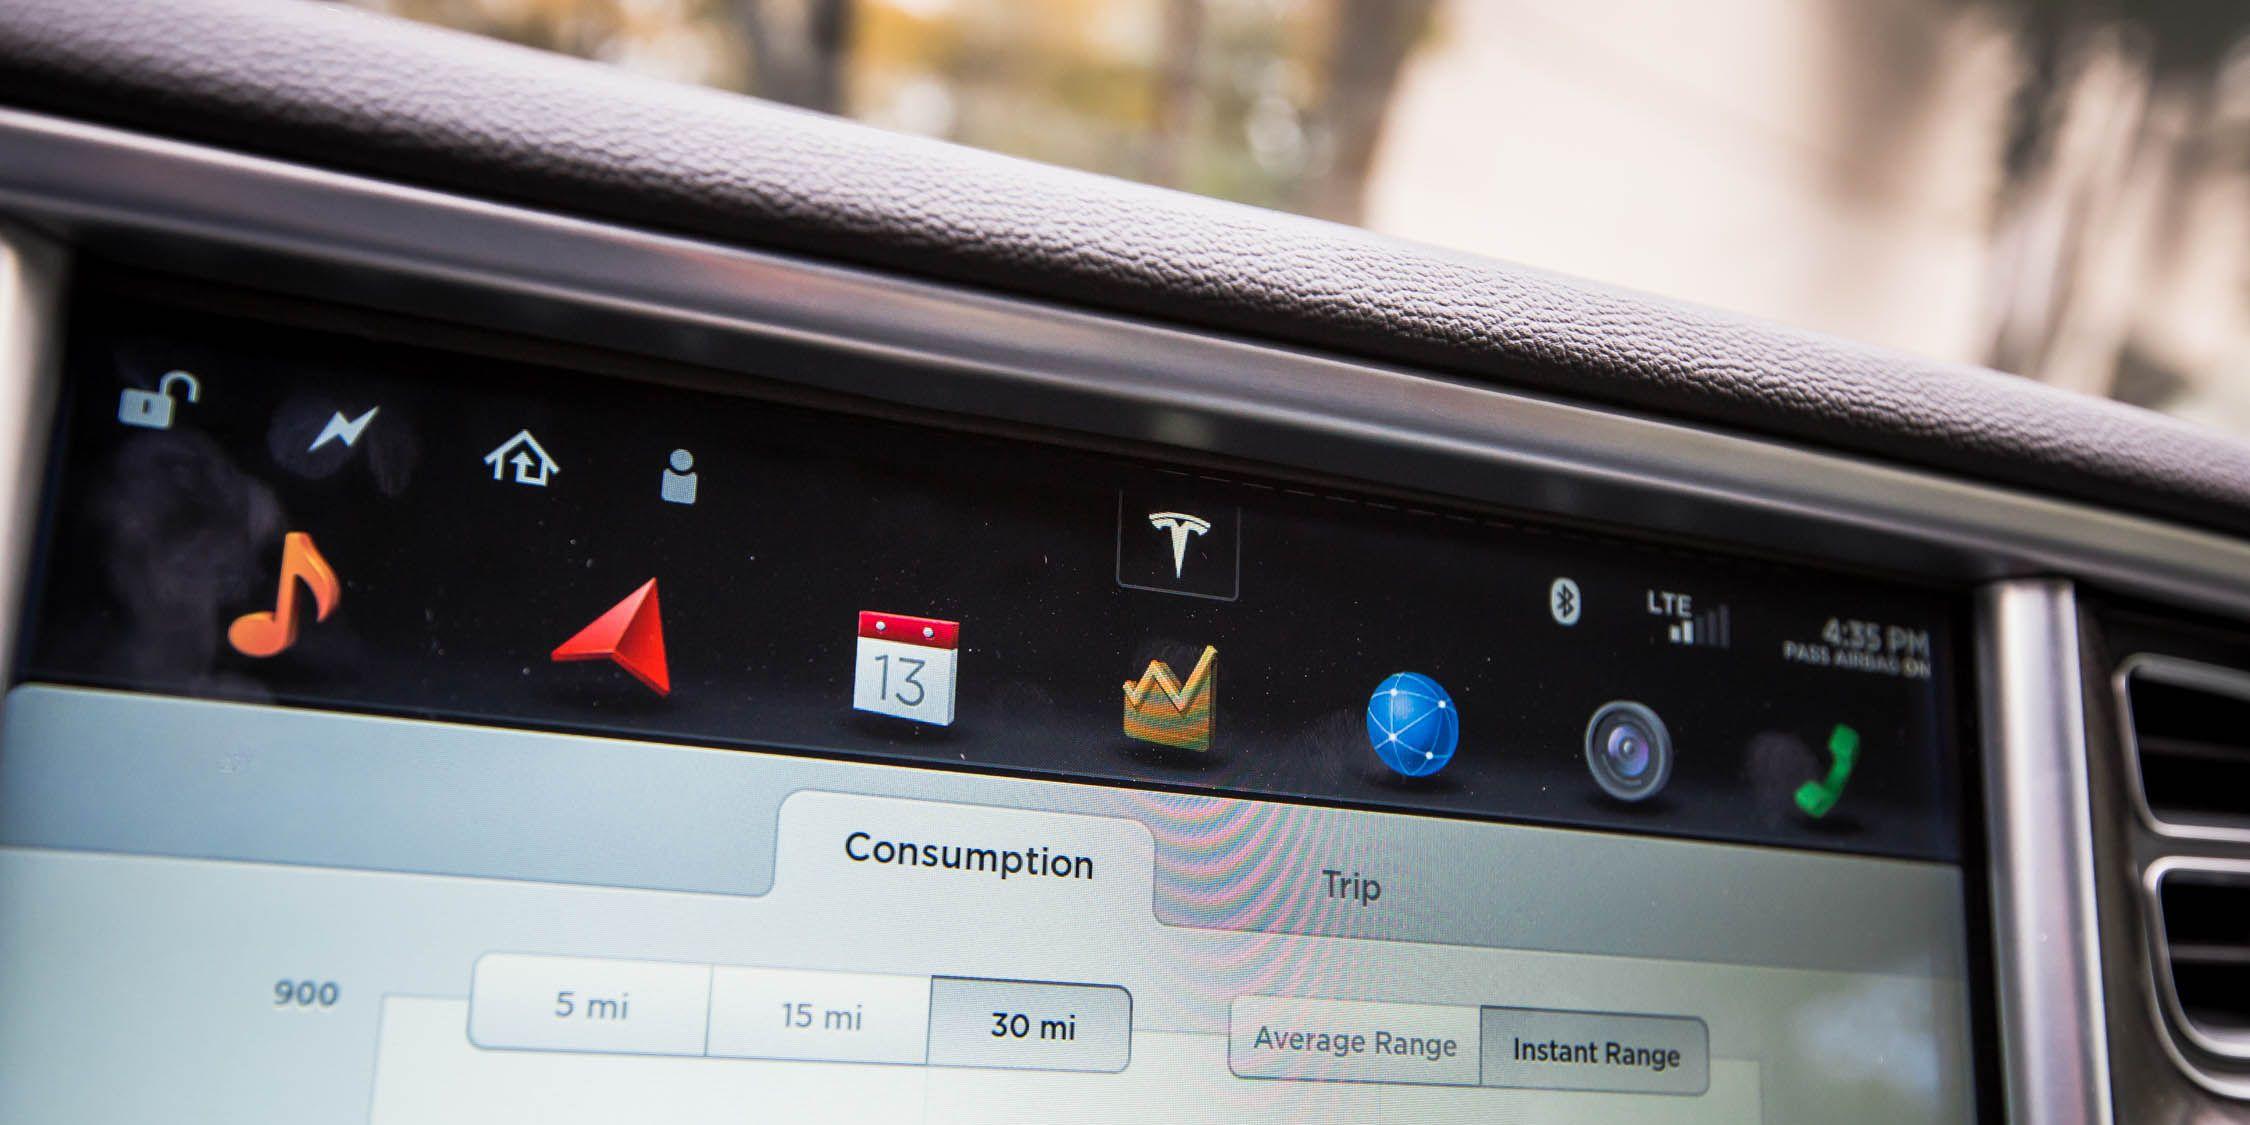 Elon, Take the Wheel! We Test Tesla's New Autopilot Feature